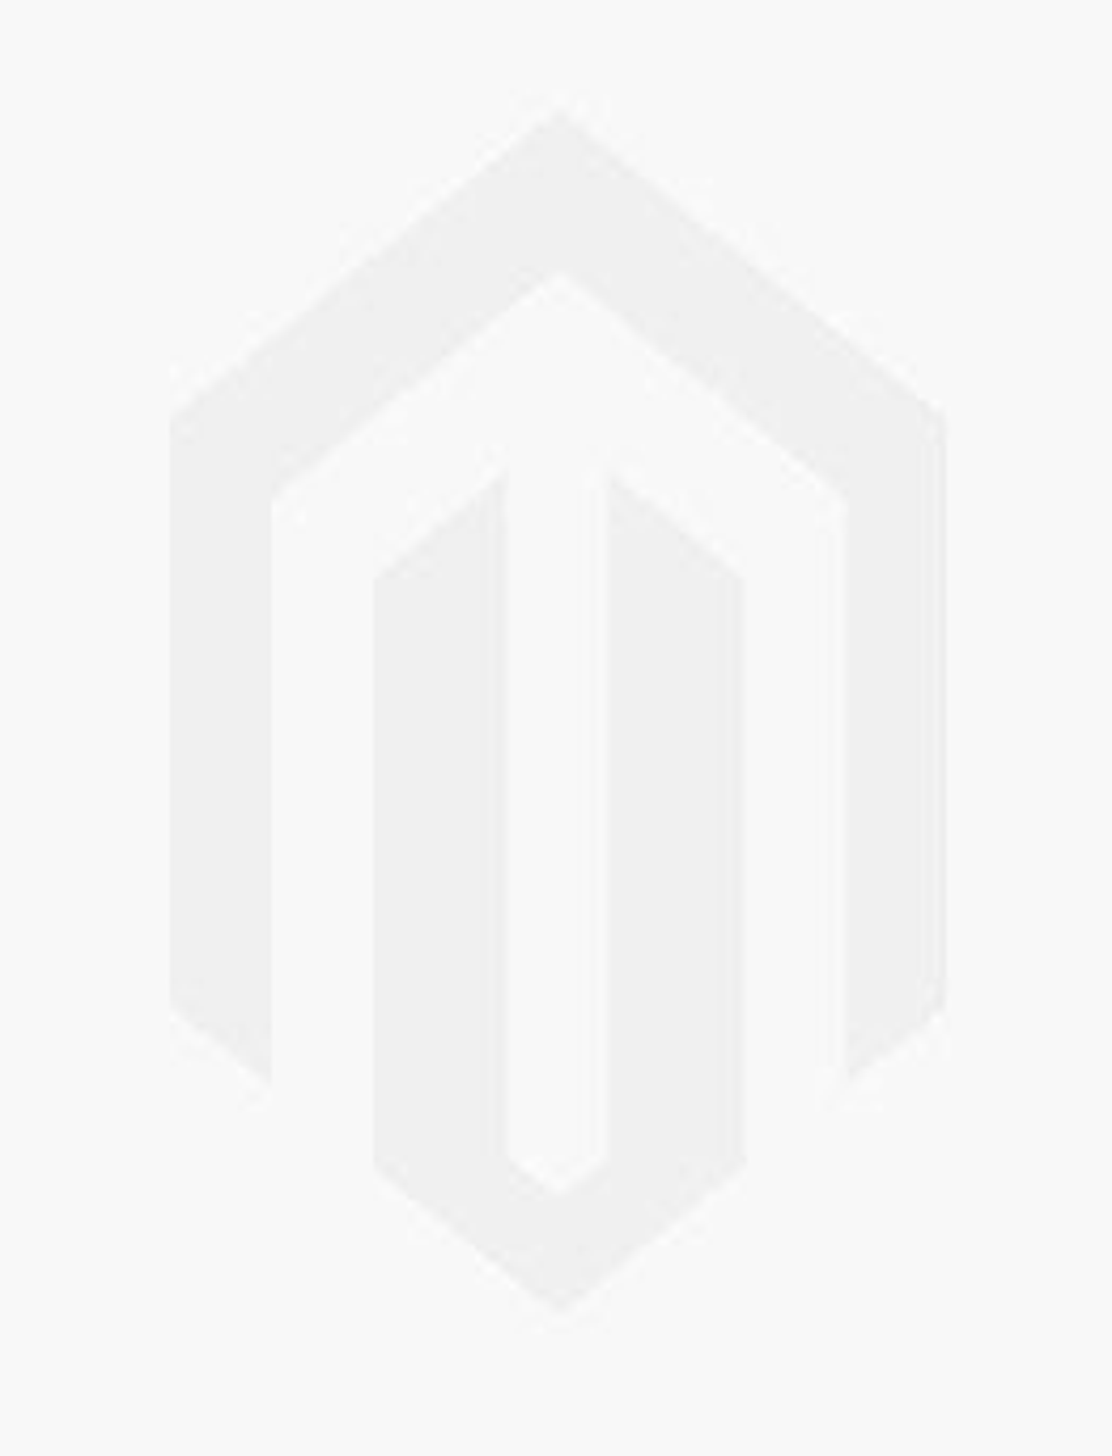 14k straight bb 3.9mm balls Image #1